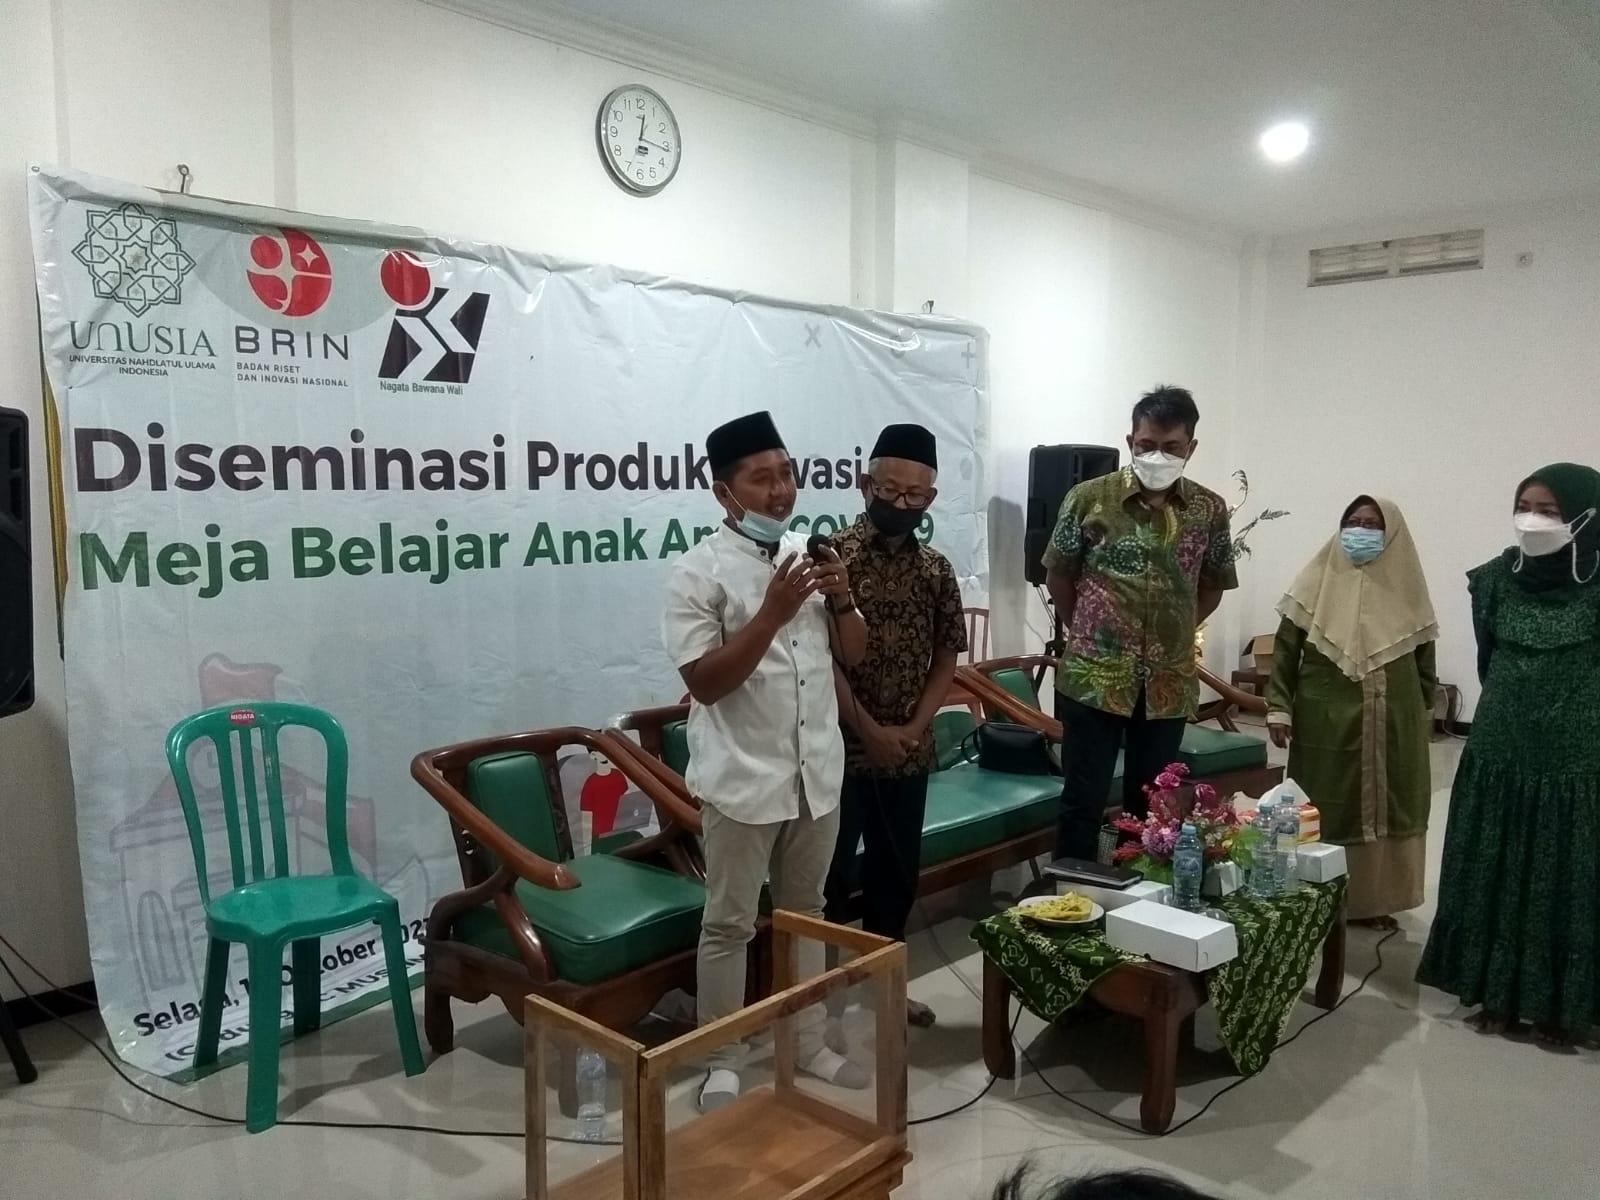 Direktur Yayasan Tanali Zakky Alayyubi memperlihatkan meja belajar aman Covid-19 ke sejumlah peserta penerima bantuan. (Foto: Dokumen/Tugu Jatim)